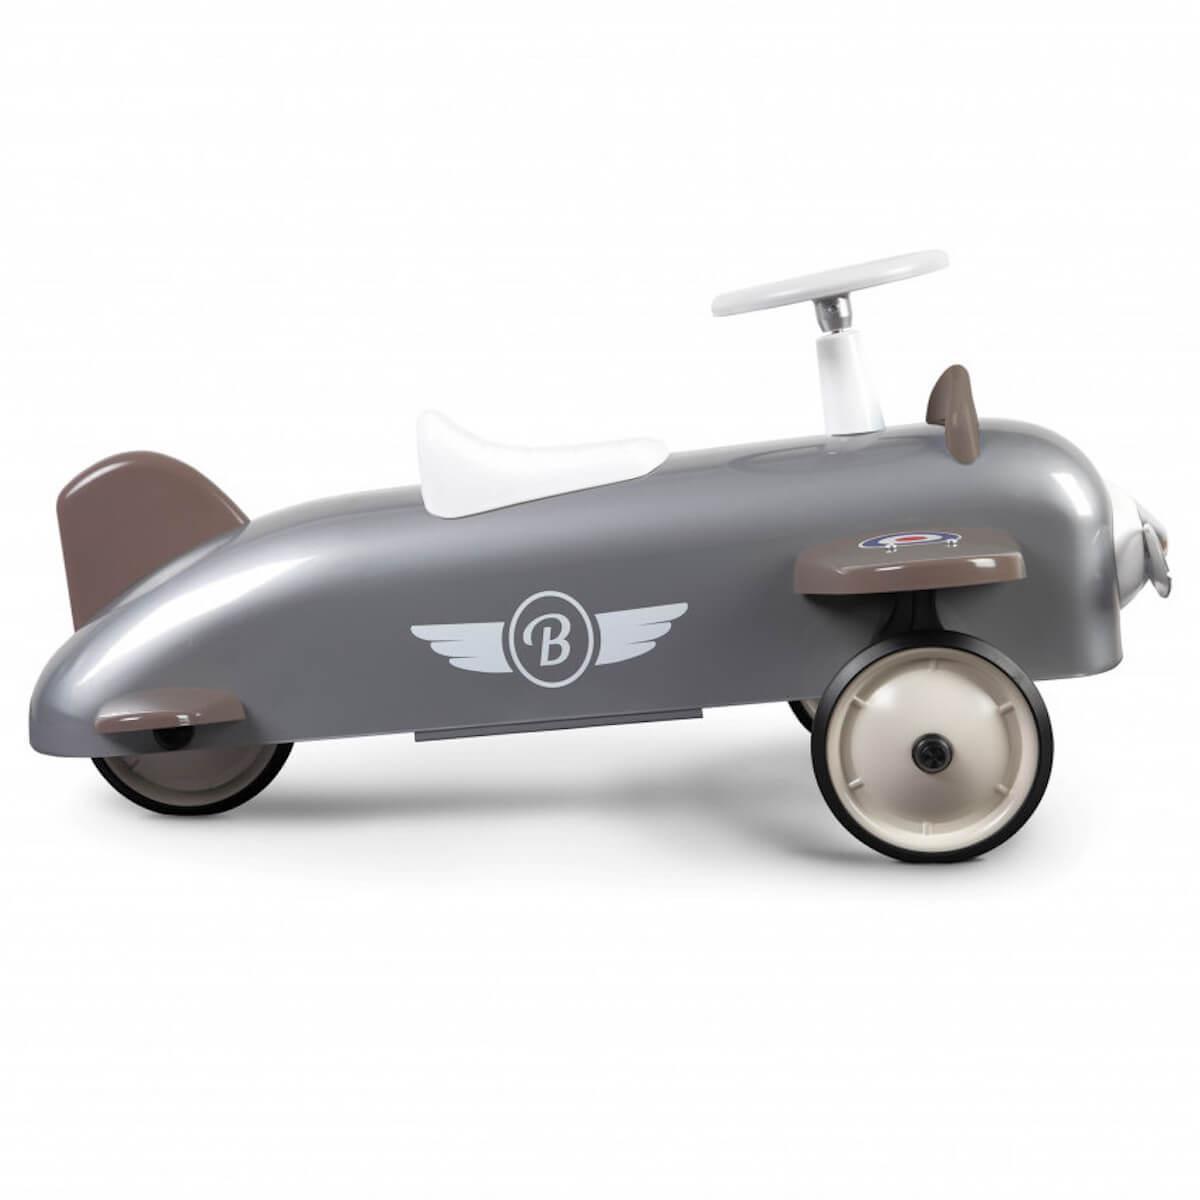 Correpasillos avión SPEEDSTER Baghera